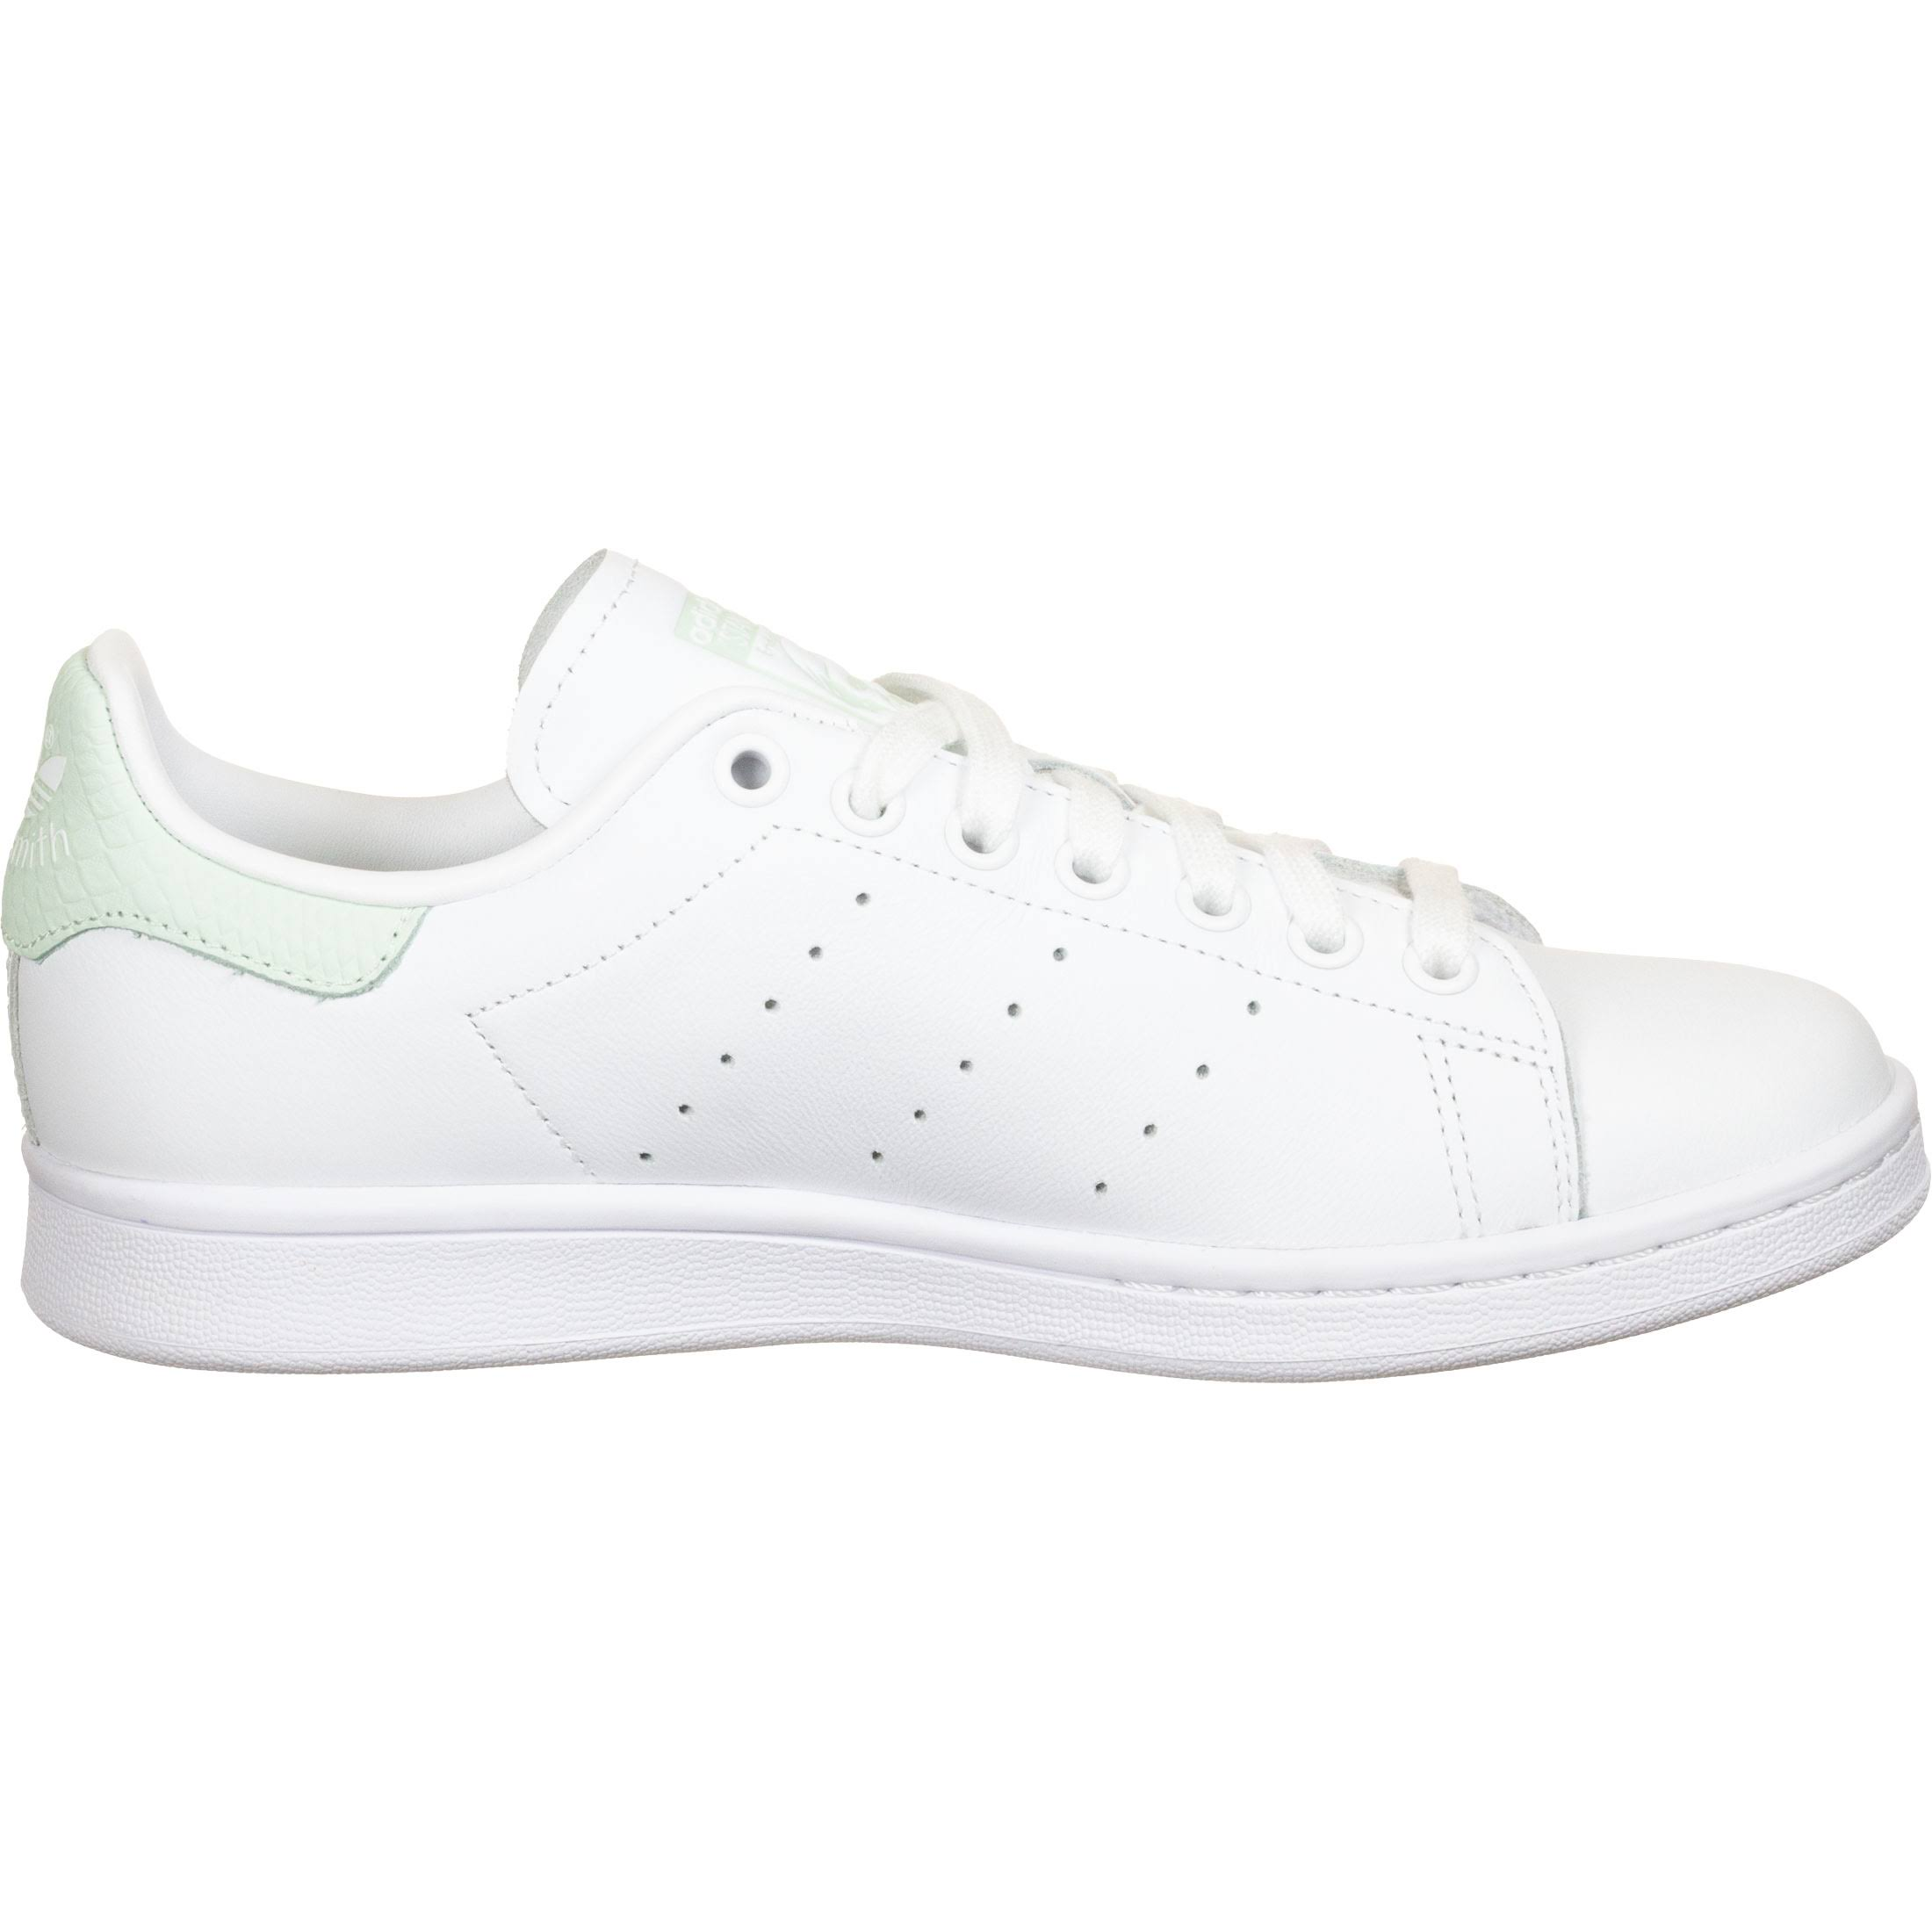 Adidas Originals 'Stan Smith W' Trainers - White